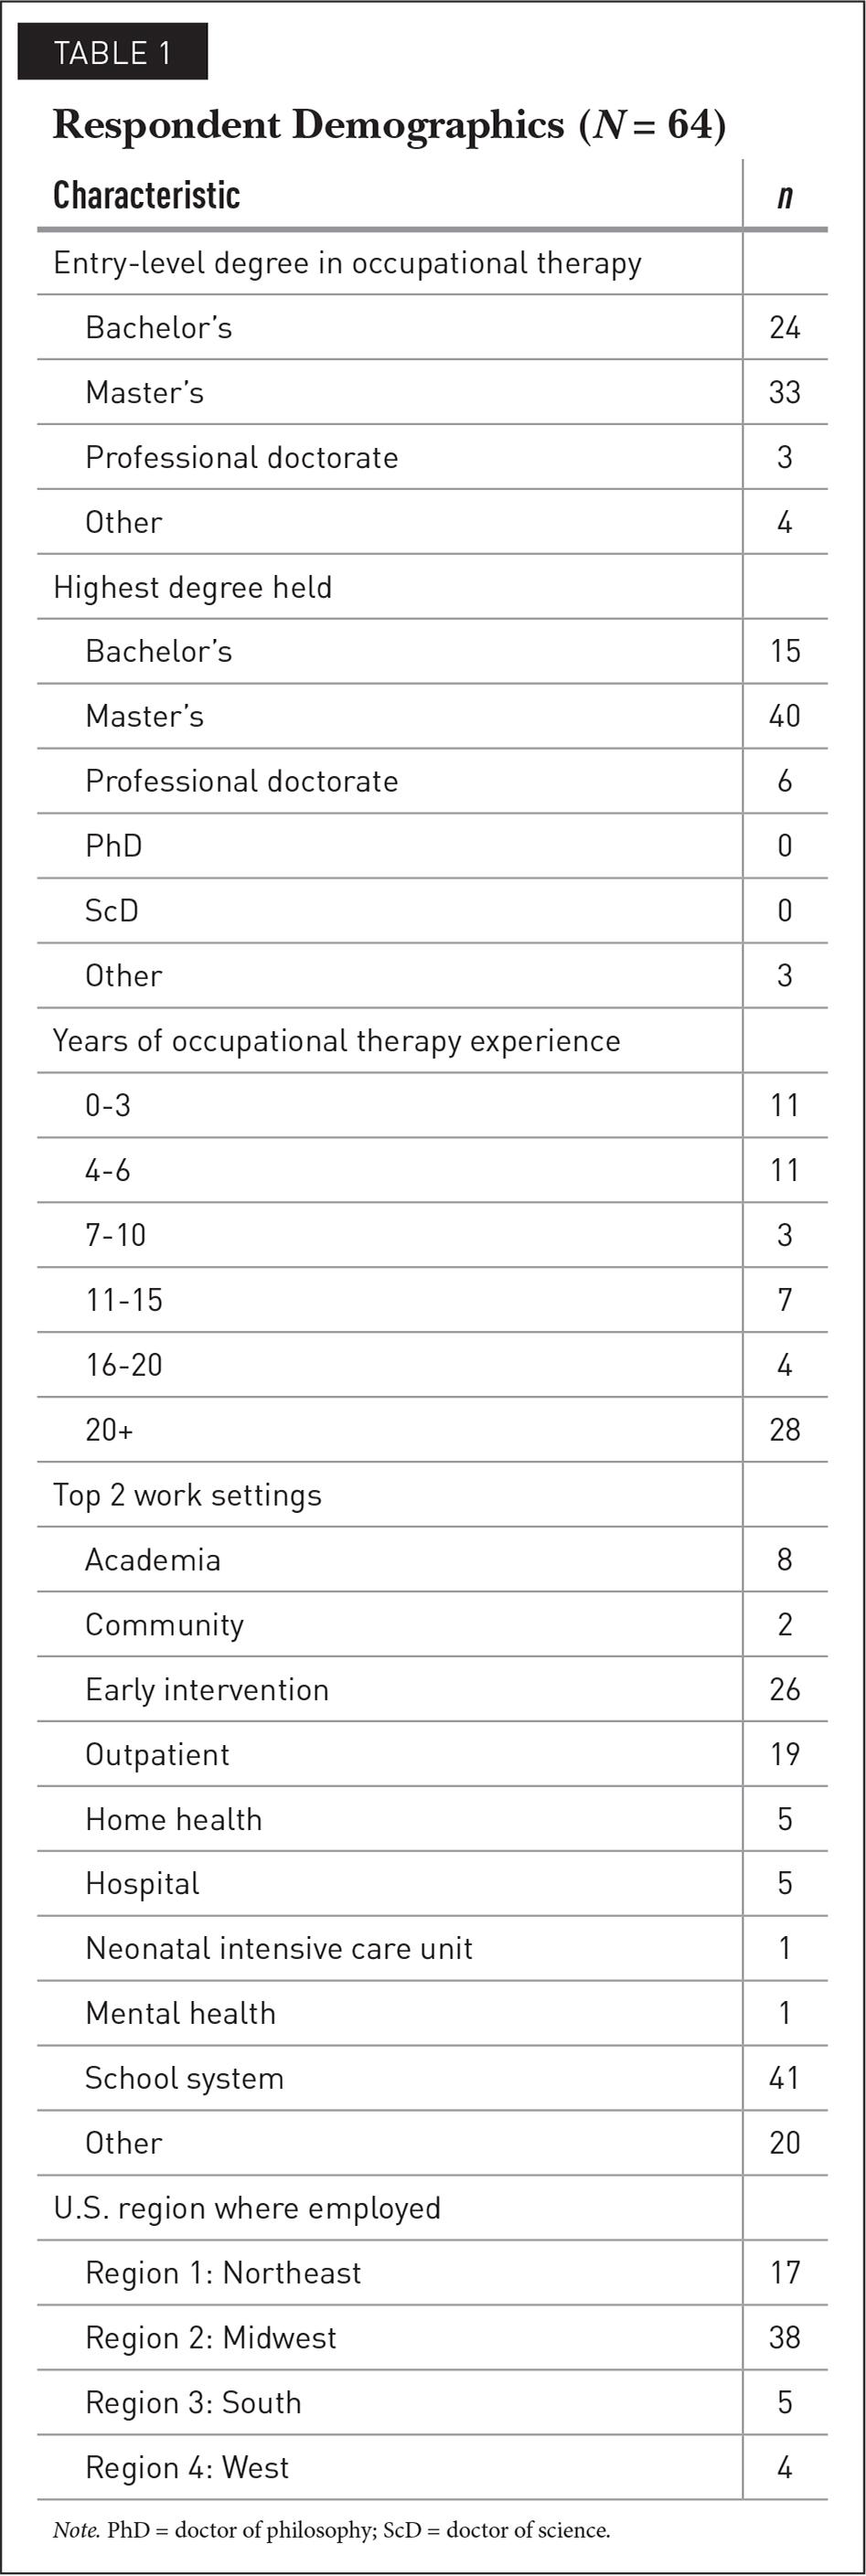 Respondent Demographics (N = 64)